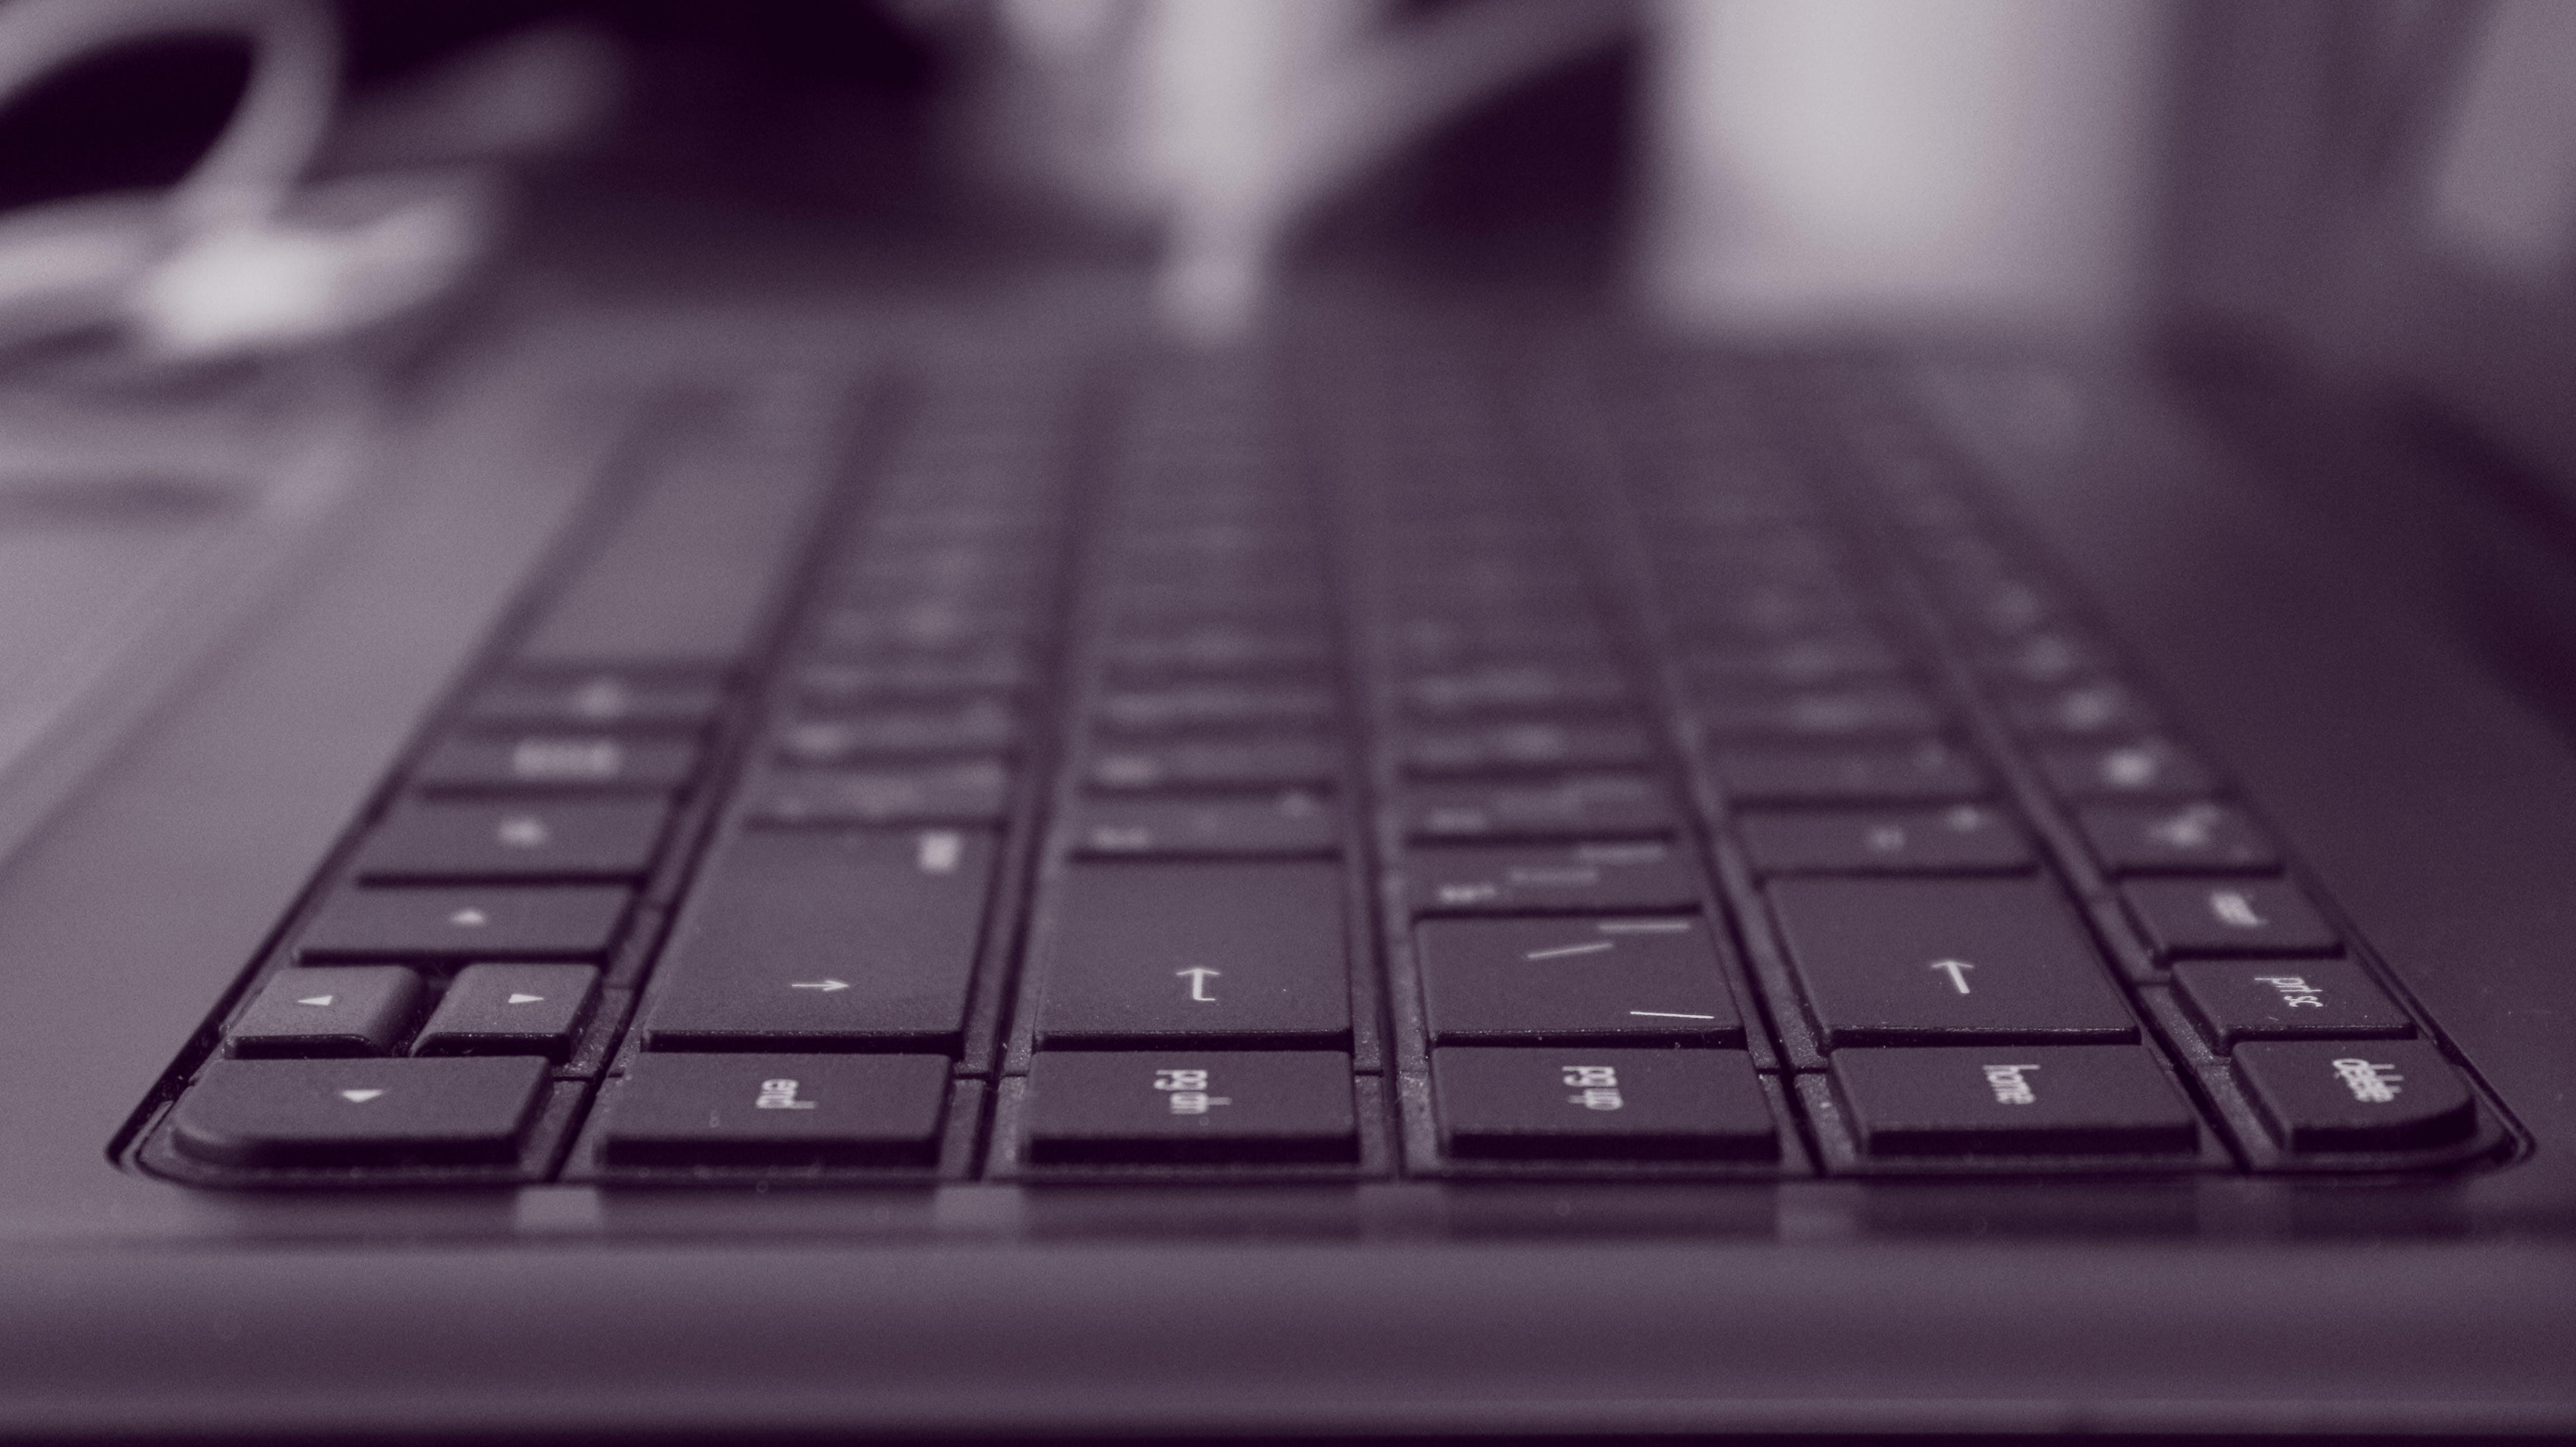 Selective Blur of Black Computer Keys